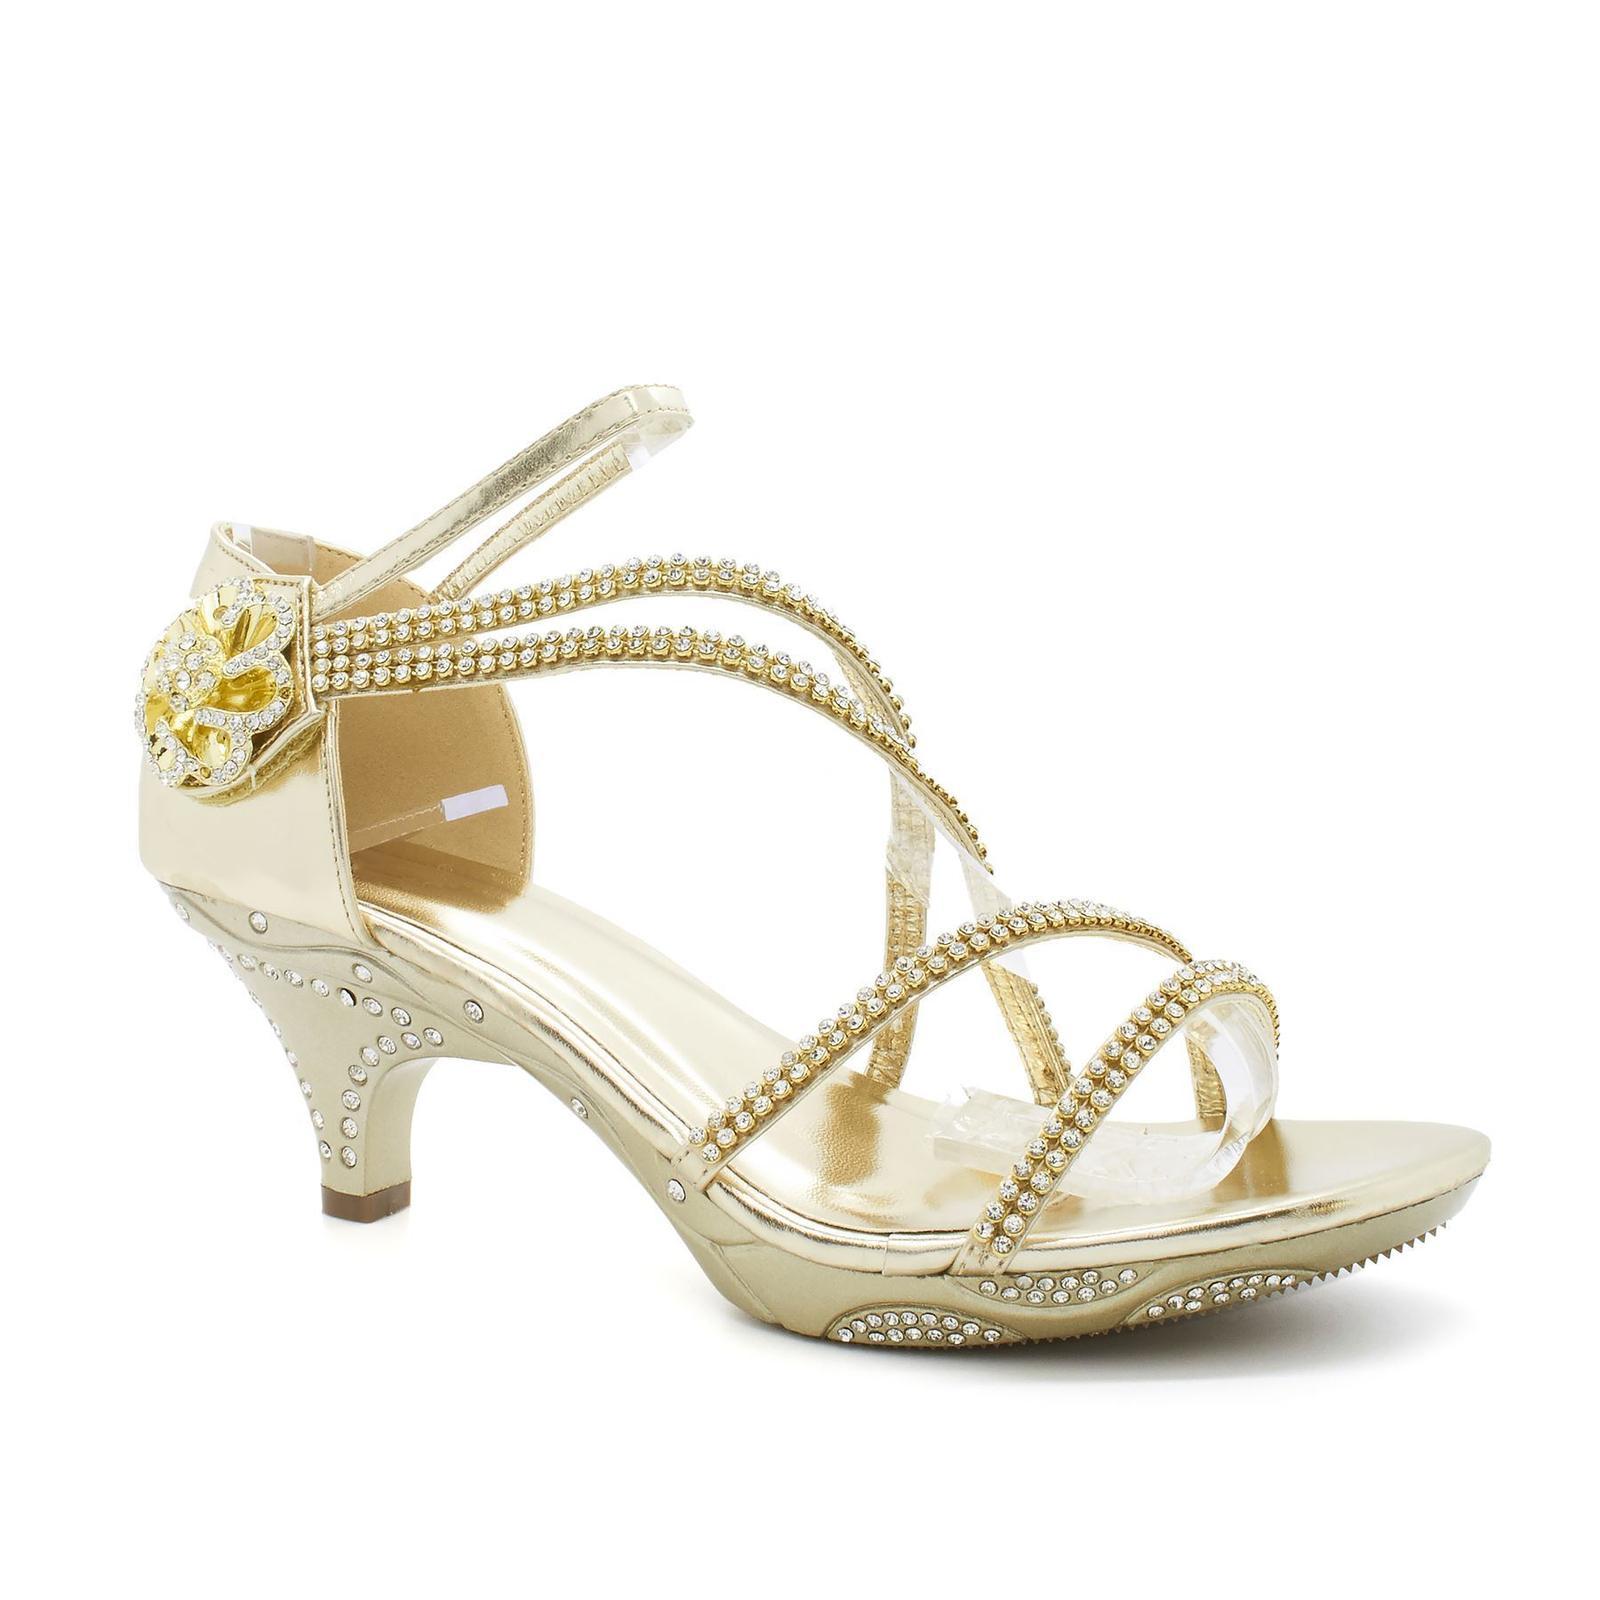 63610f63a3cc Zlaté plesové sandálky